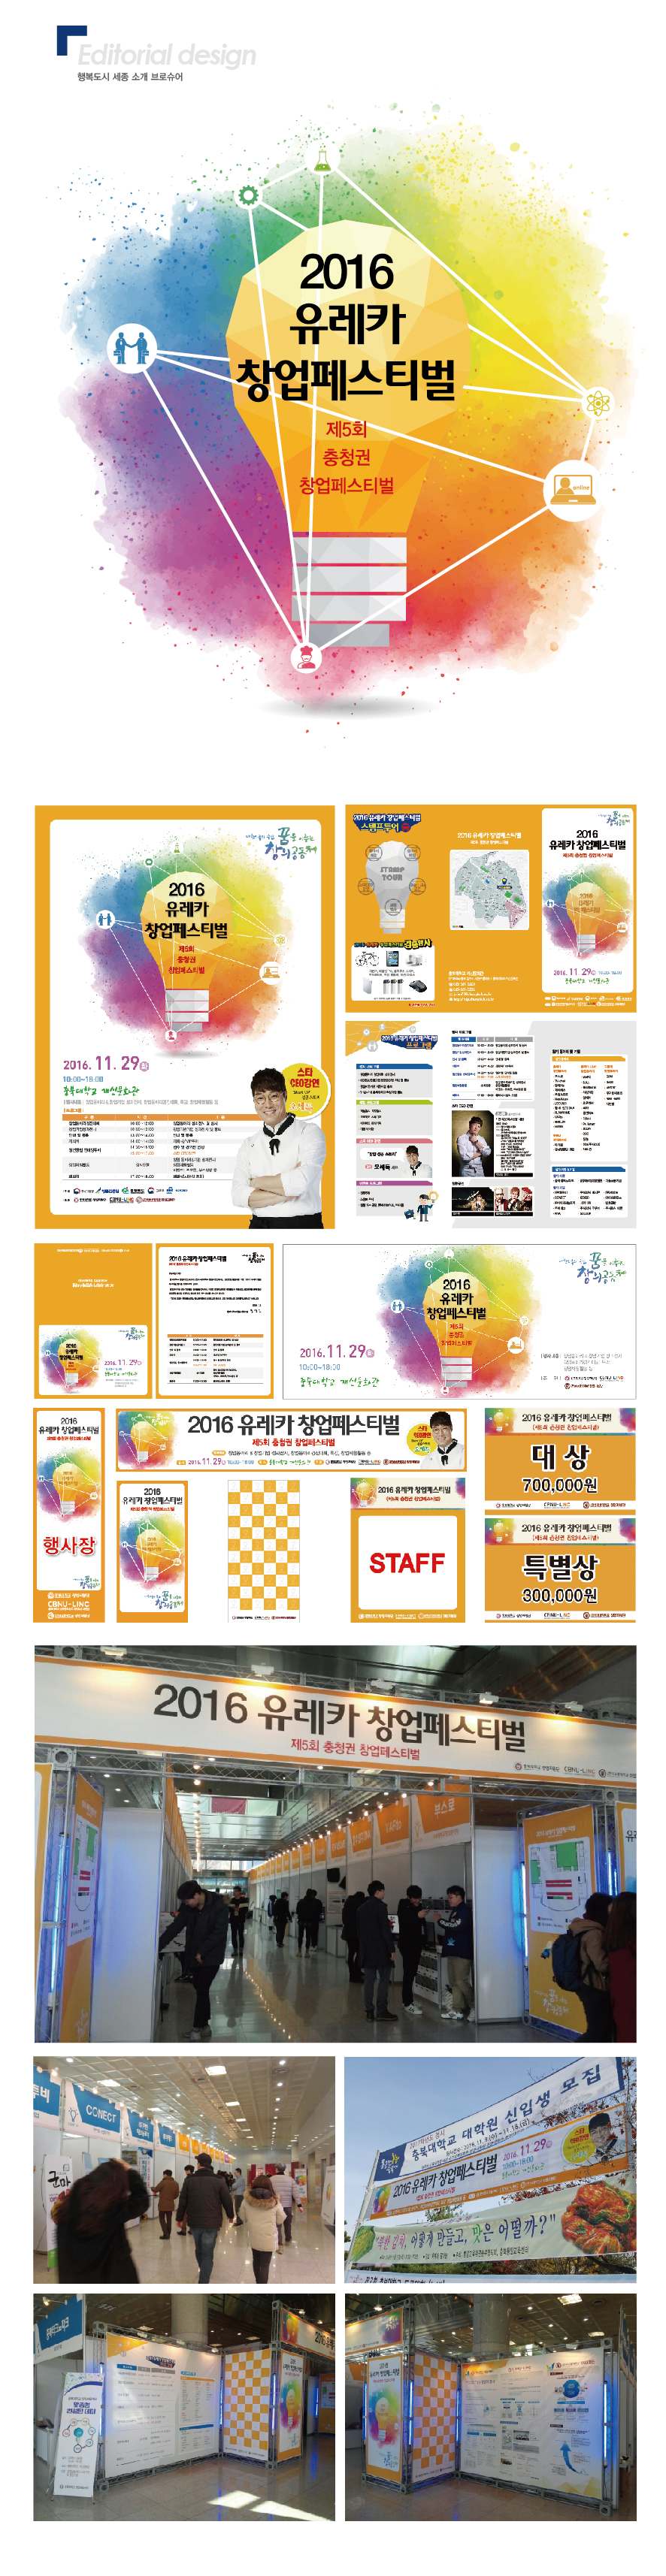 02 Editorial design-13.jpg